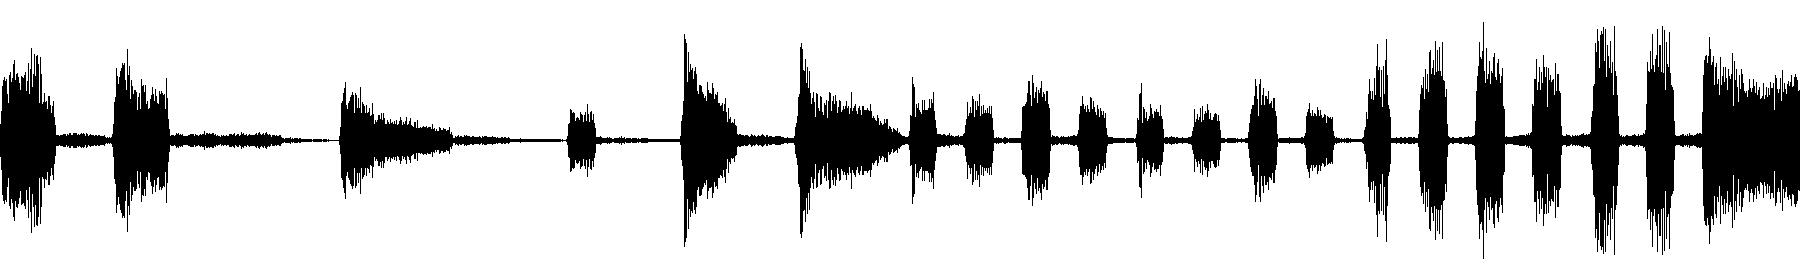 veh2 special sounds   36